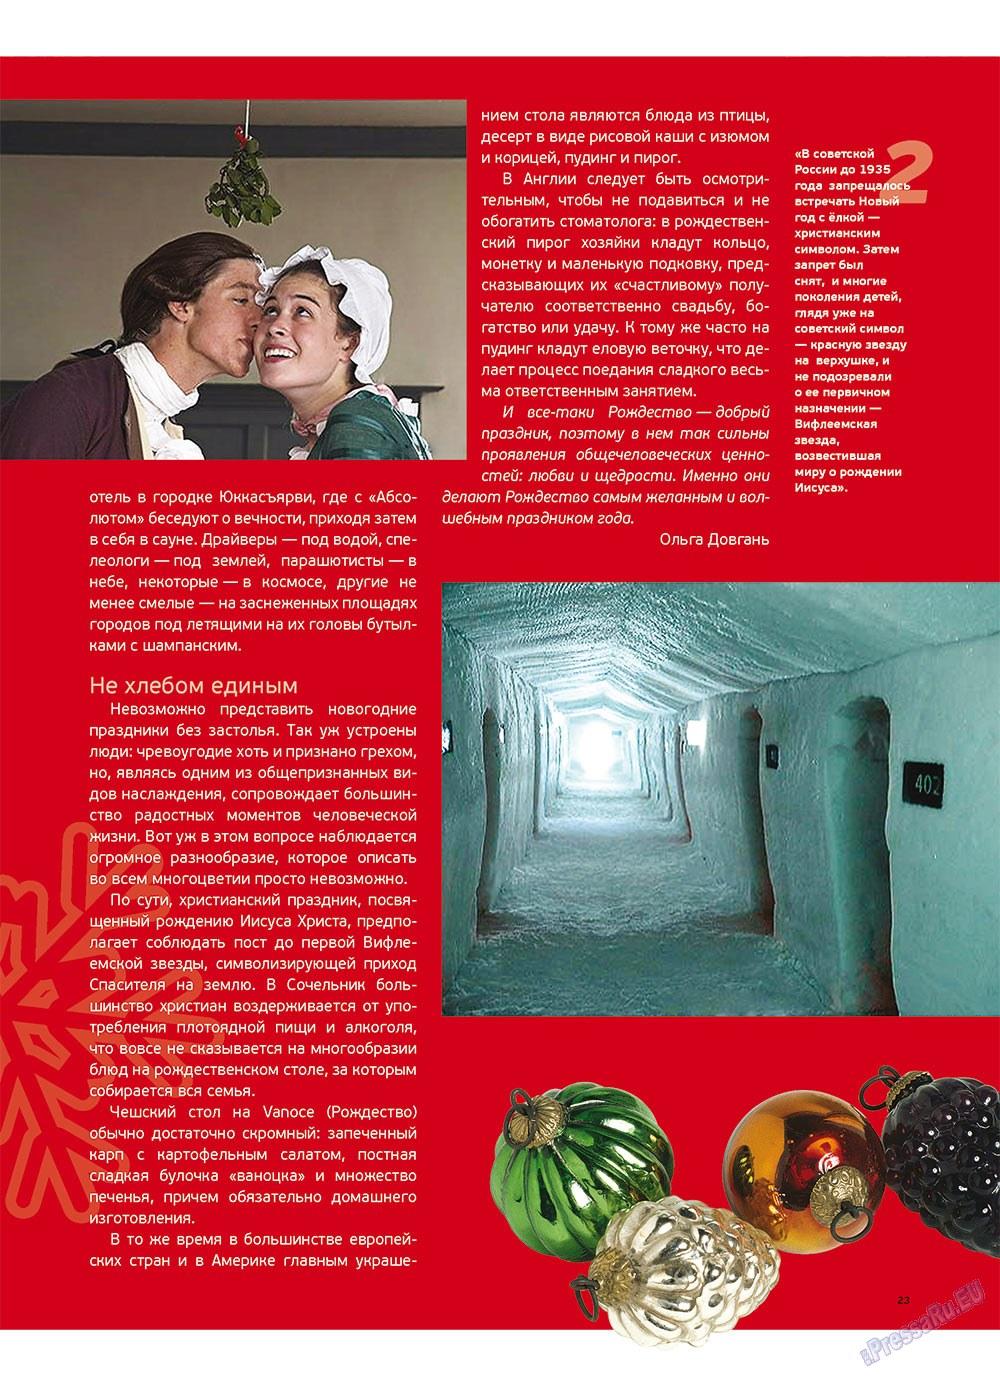 Артек (журнал). 2011 год, номер 5, стр. 25